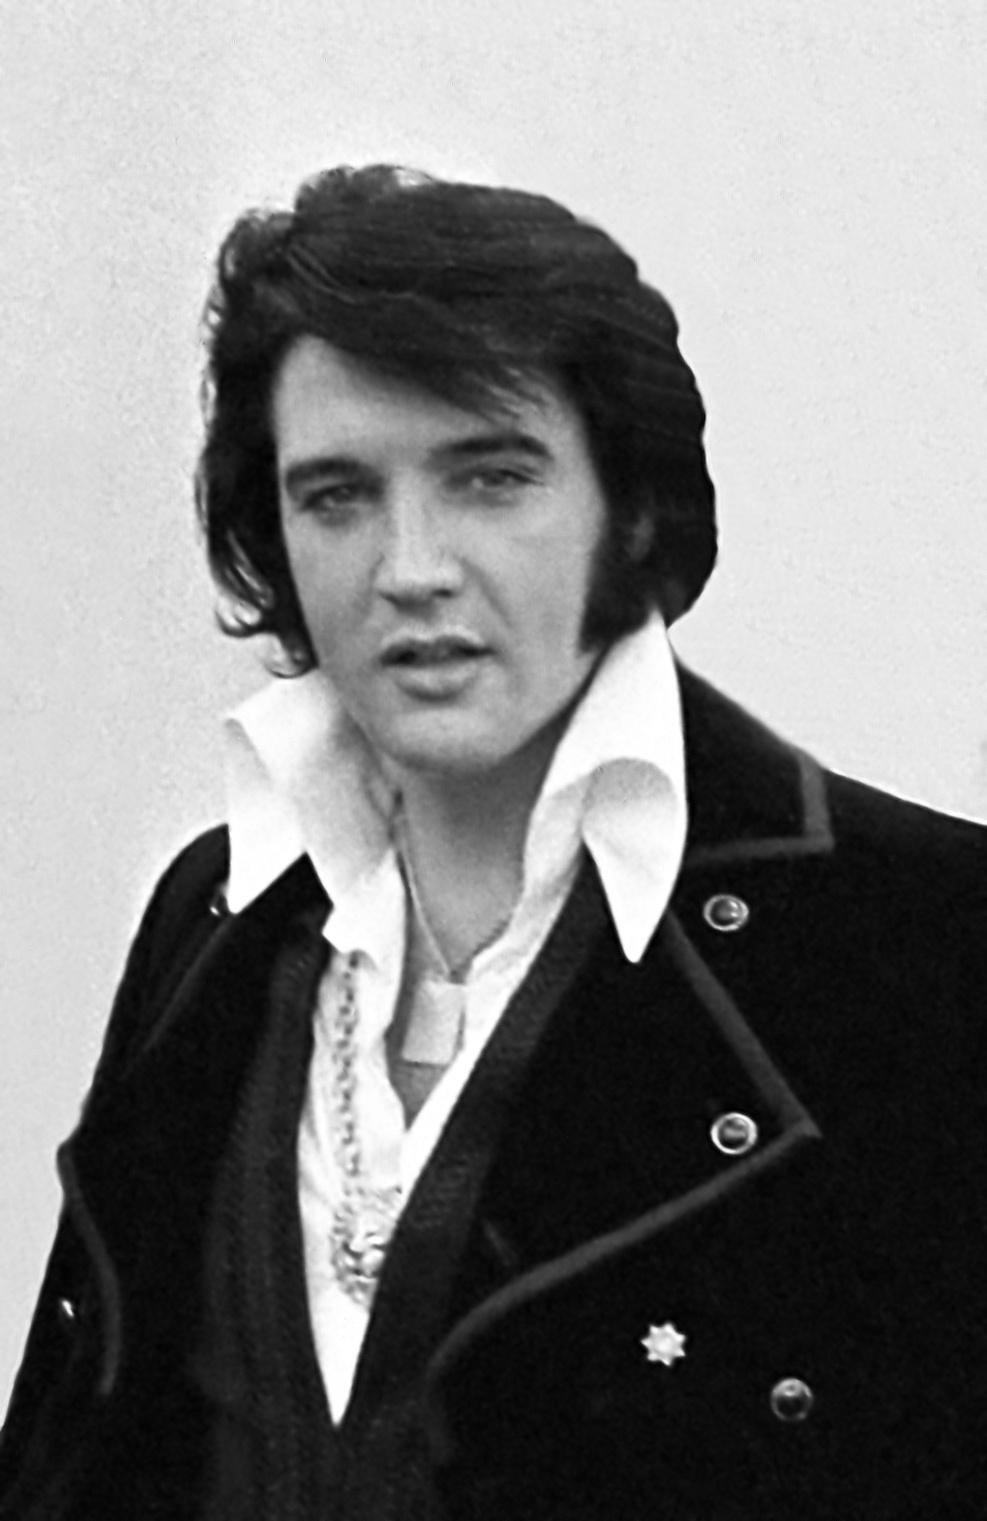 Elvis Presley 1970 1960s Mens Fashion